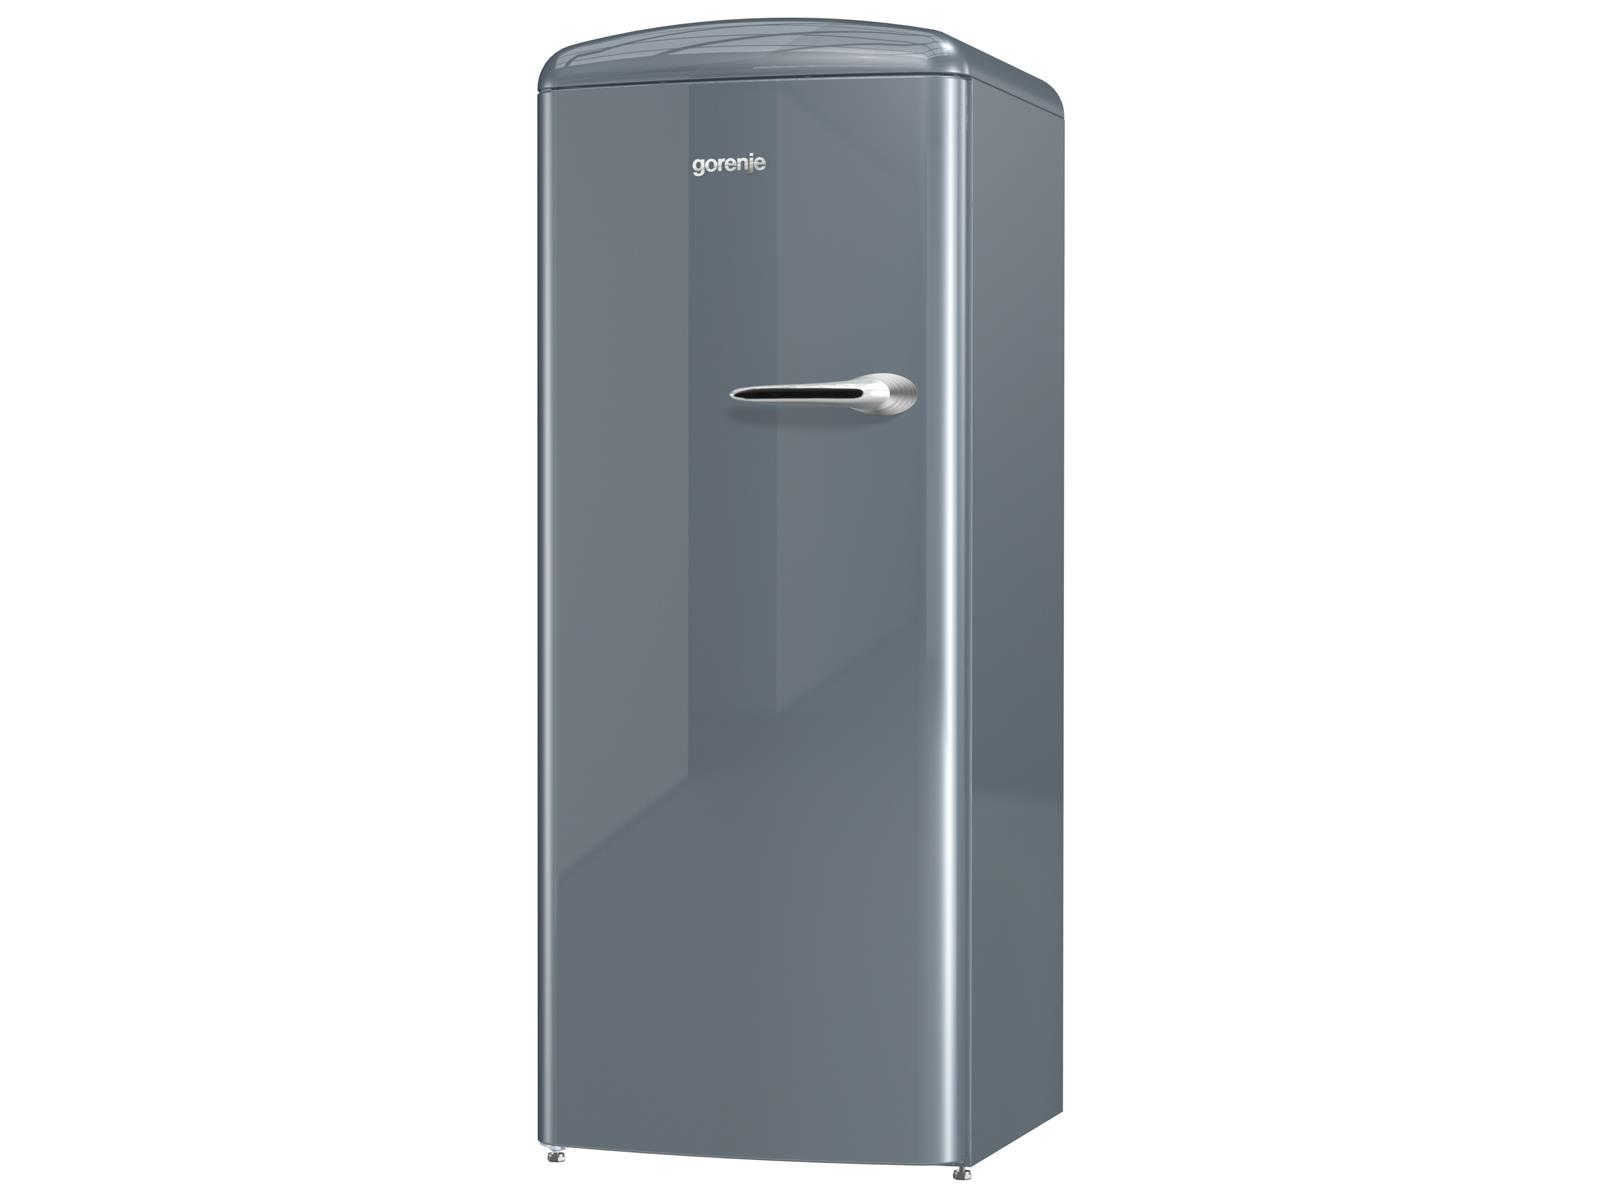 Gorenje Kühlschrank Db : Gorenje orb l standkühlschrank grau metallic